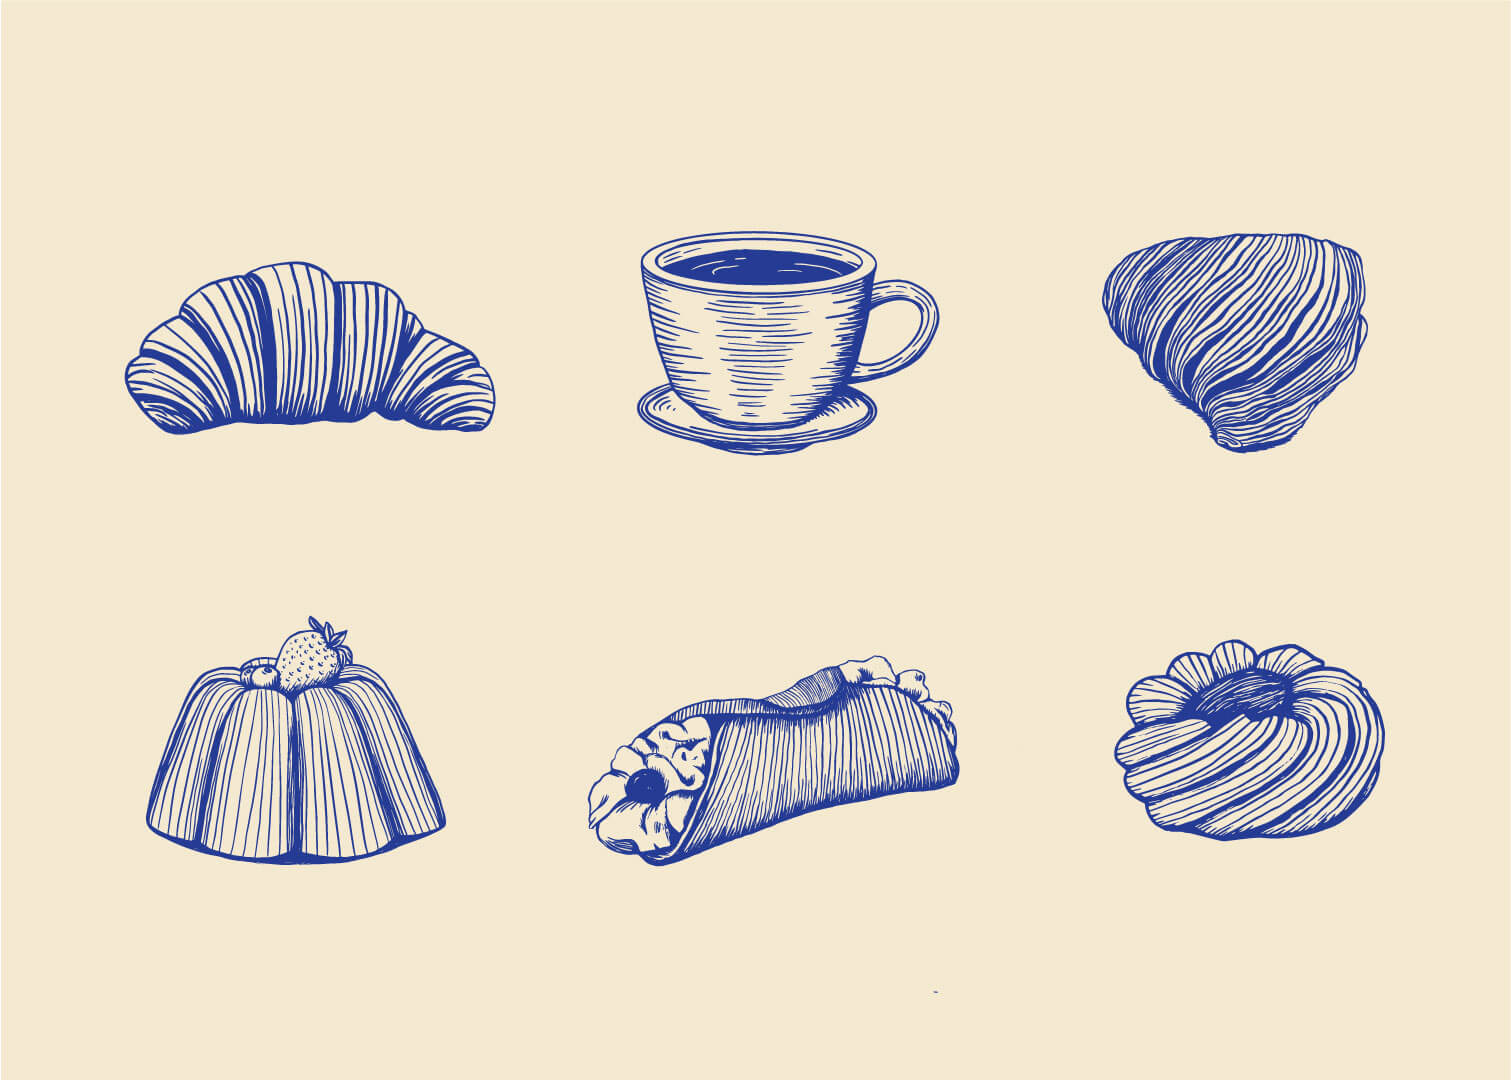 Messina Bakery & Cafe illustrations